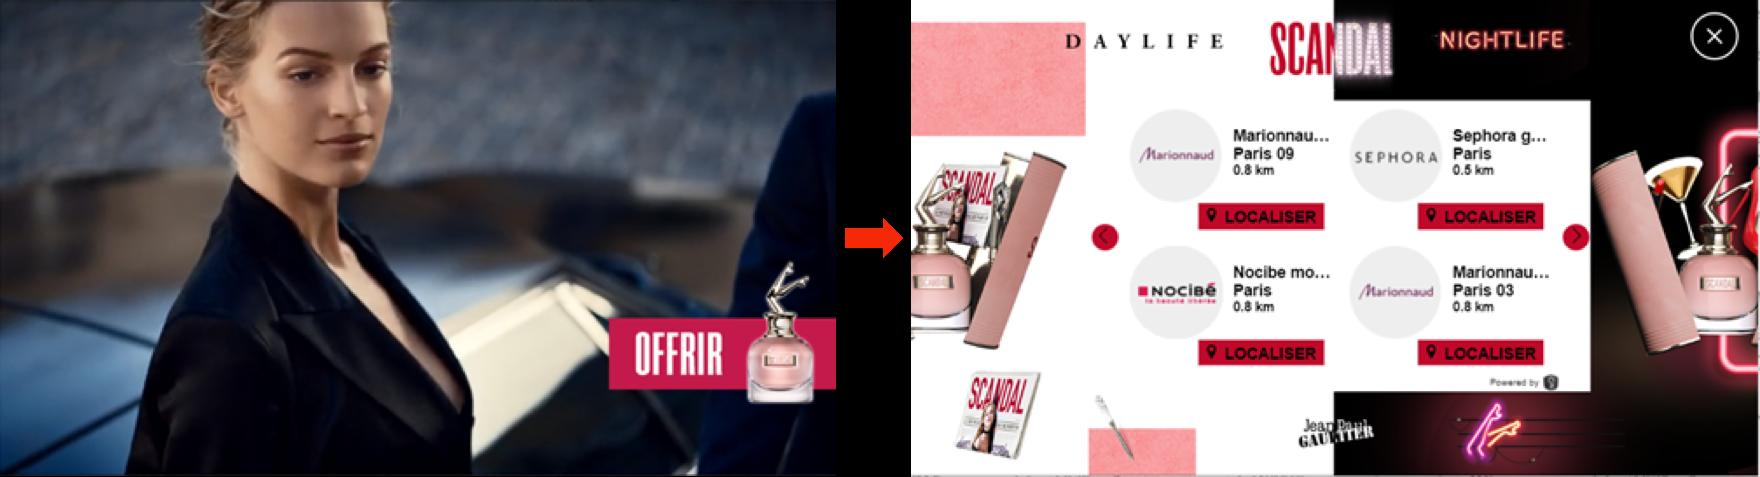 Jean Paul Gaultier shoppable video